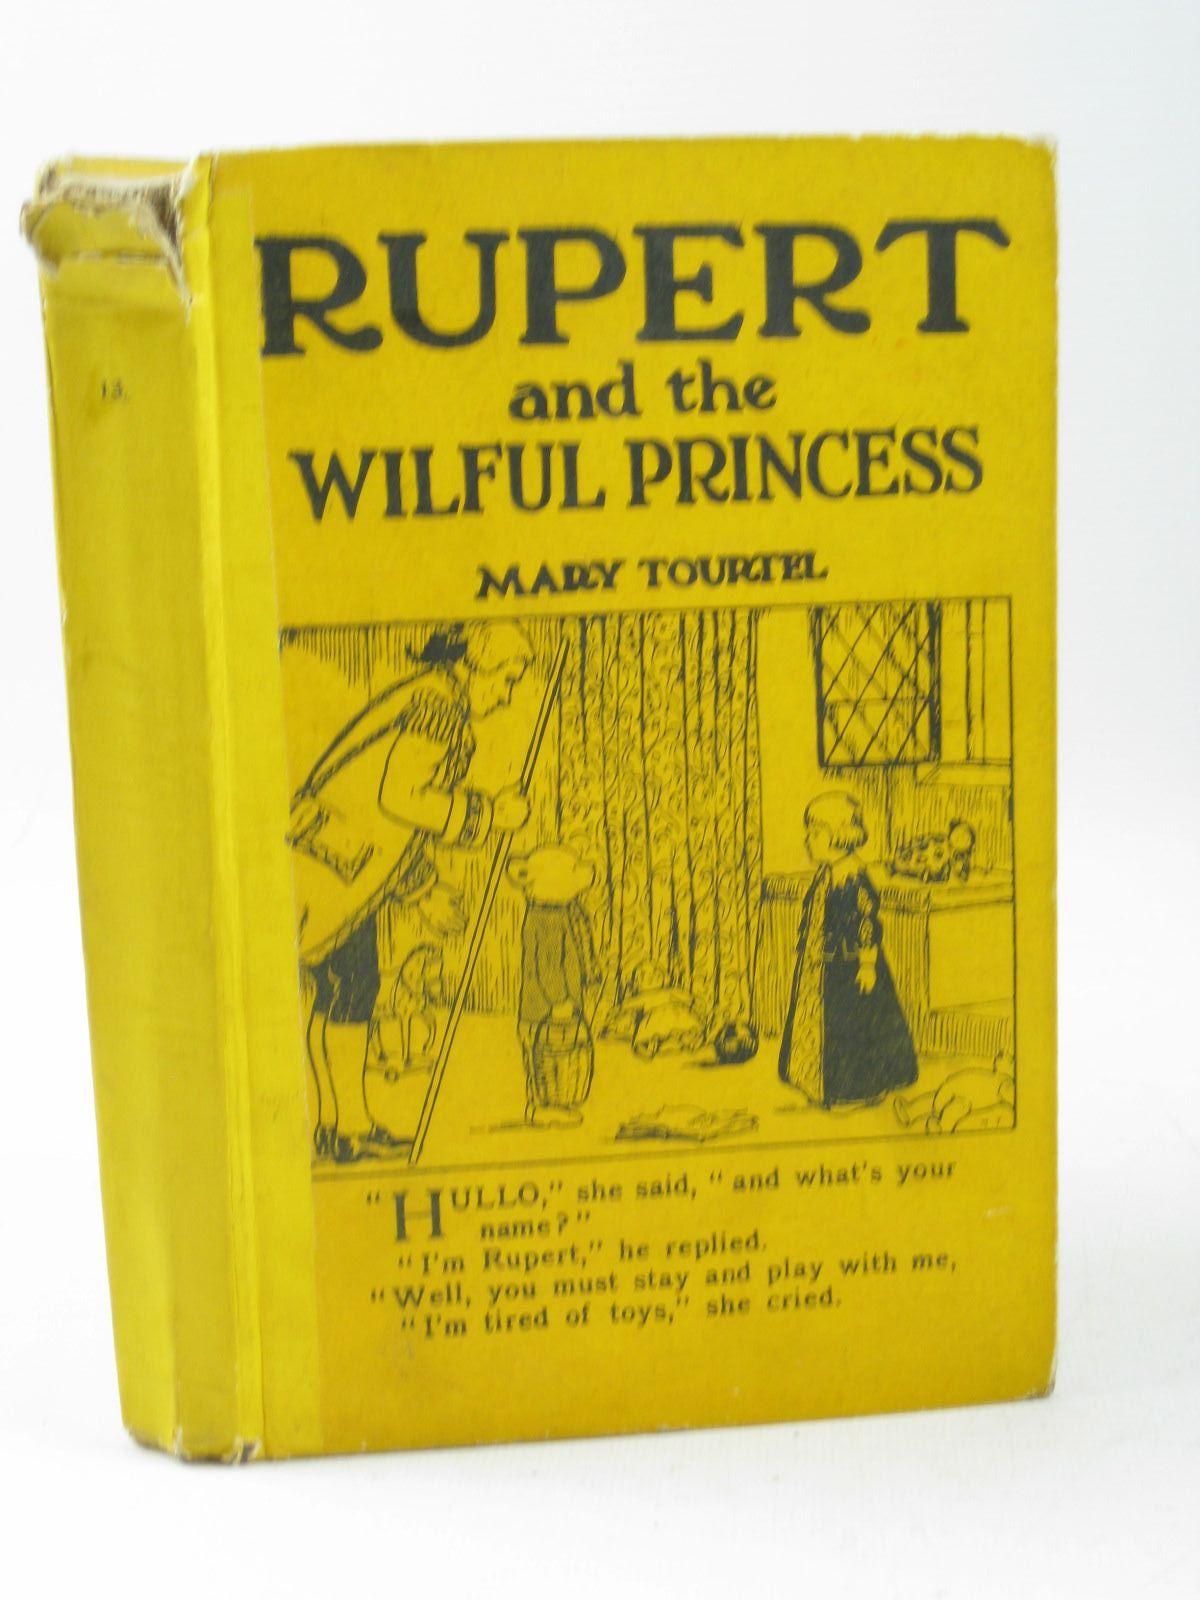 Photo of RUPERT AND THE WILFUL PRINCESS - RUPERT LITTLE BEAR LIBRARY NO. 13